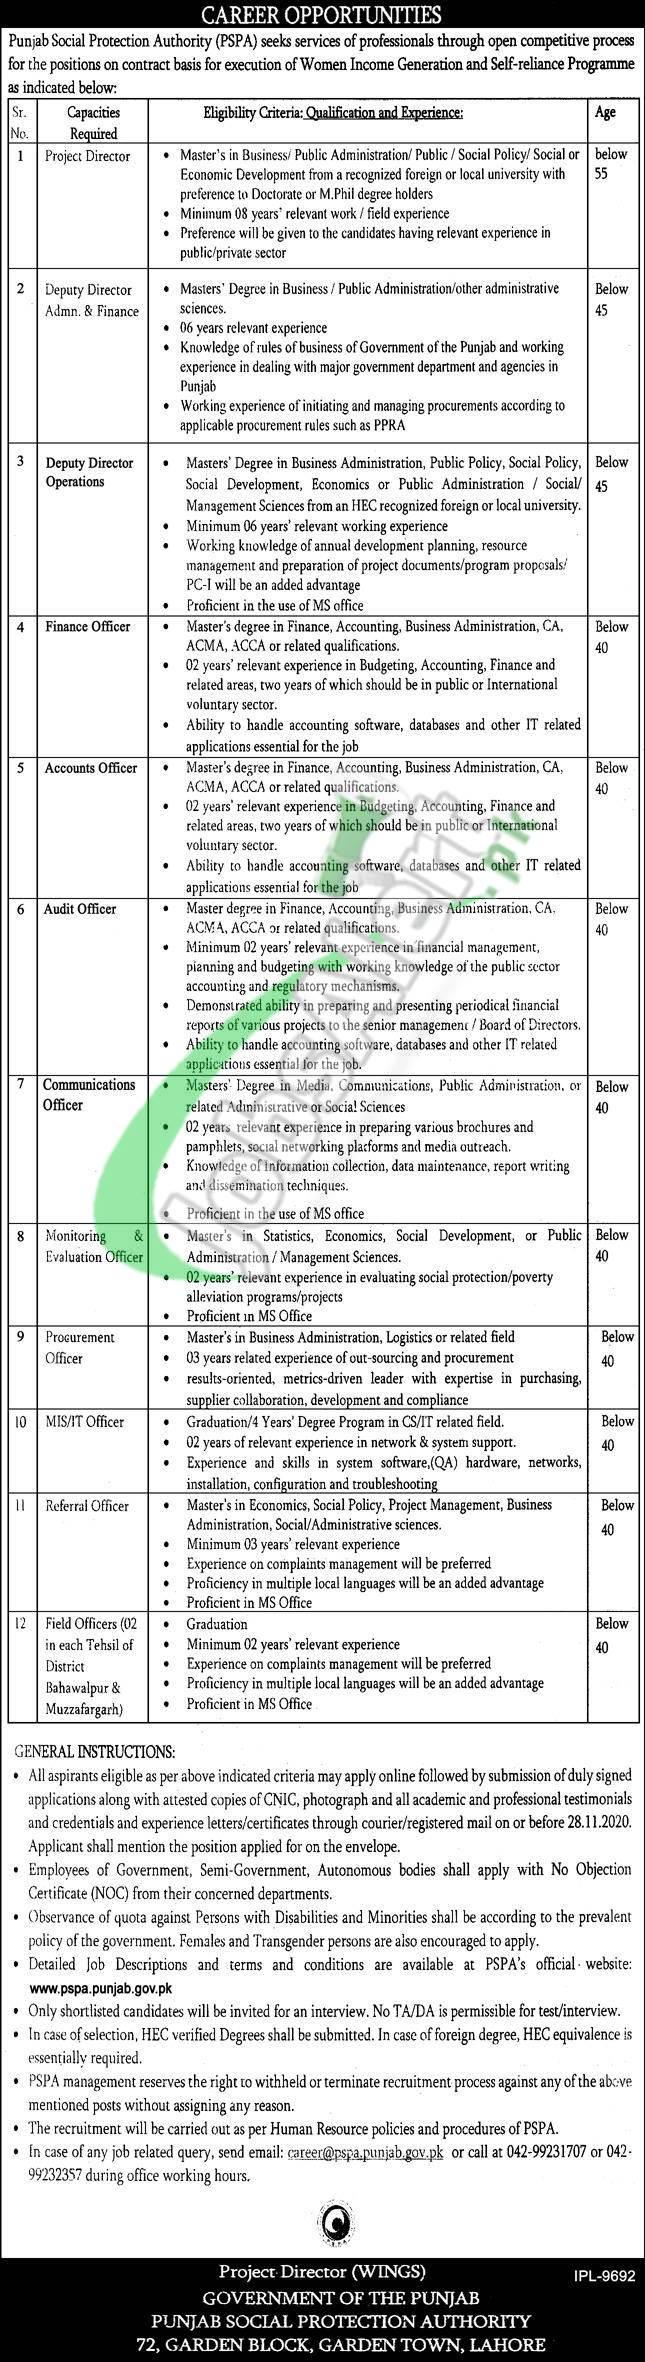 Punjab Social Protection Authority Jobs